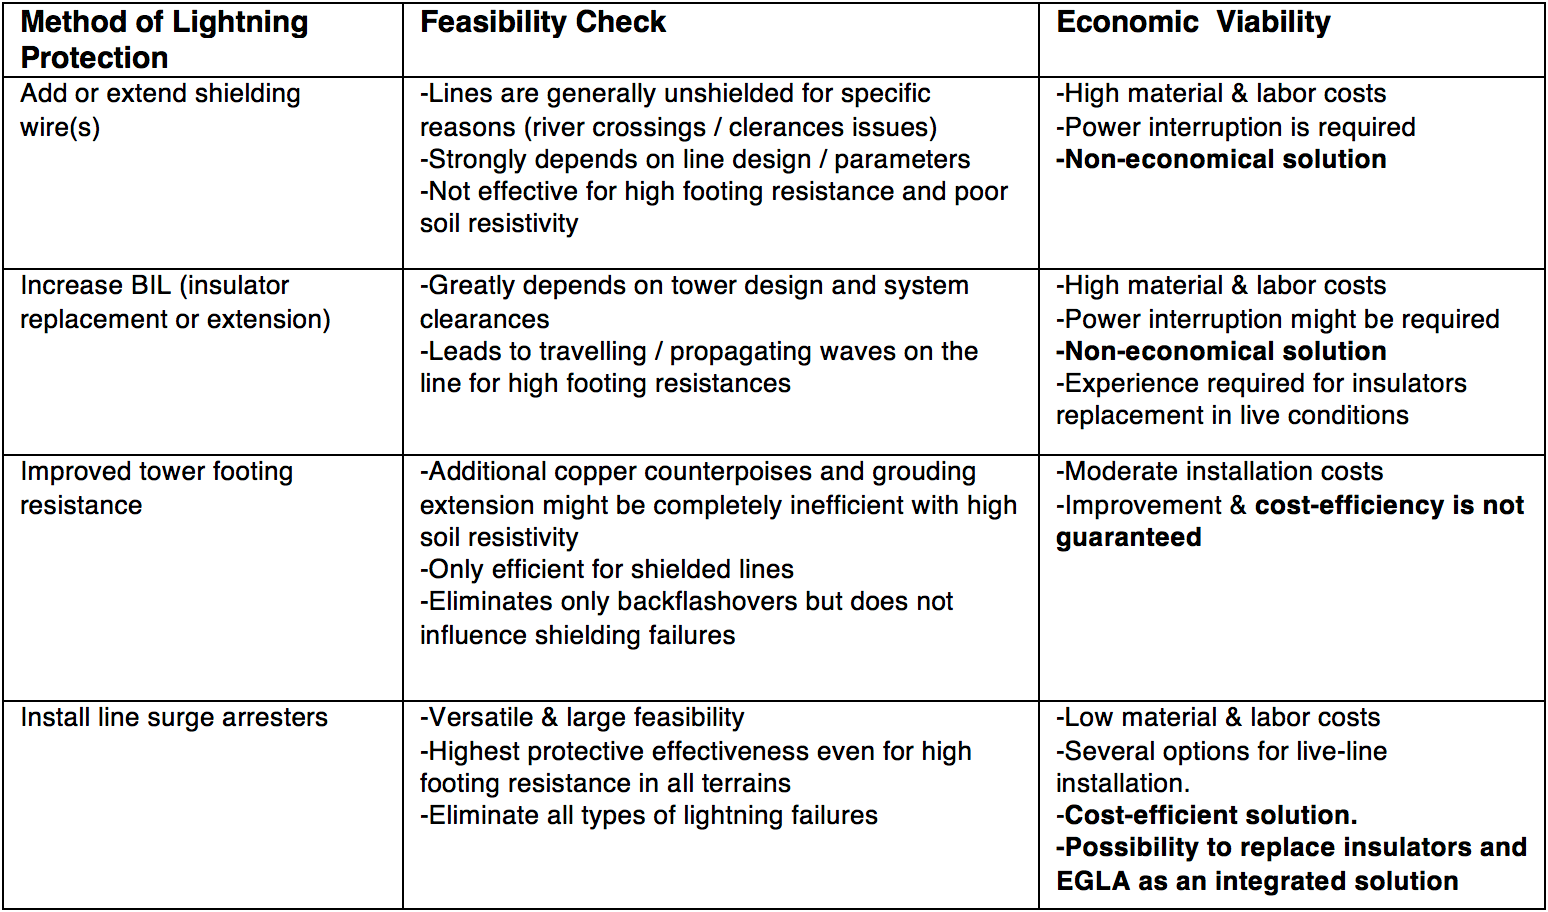 arresters Benefits & Advantages of Applying Externally Gapped Line Arresters Comparison of Alternative Mitigation Methods